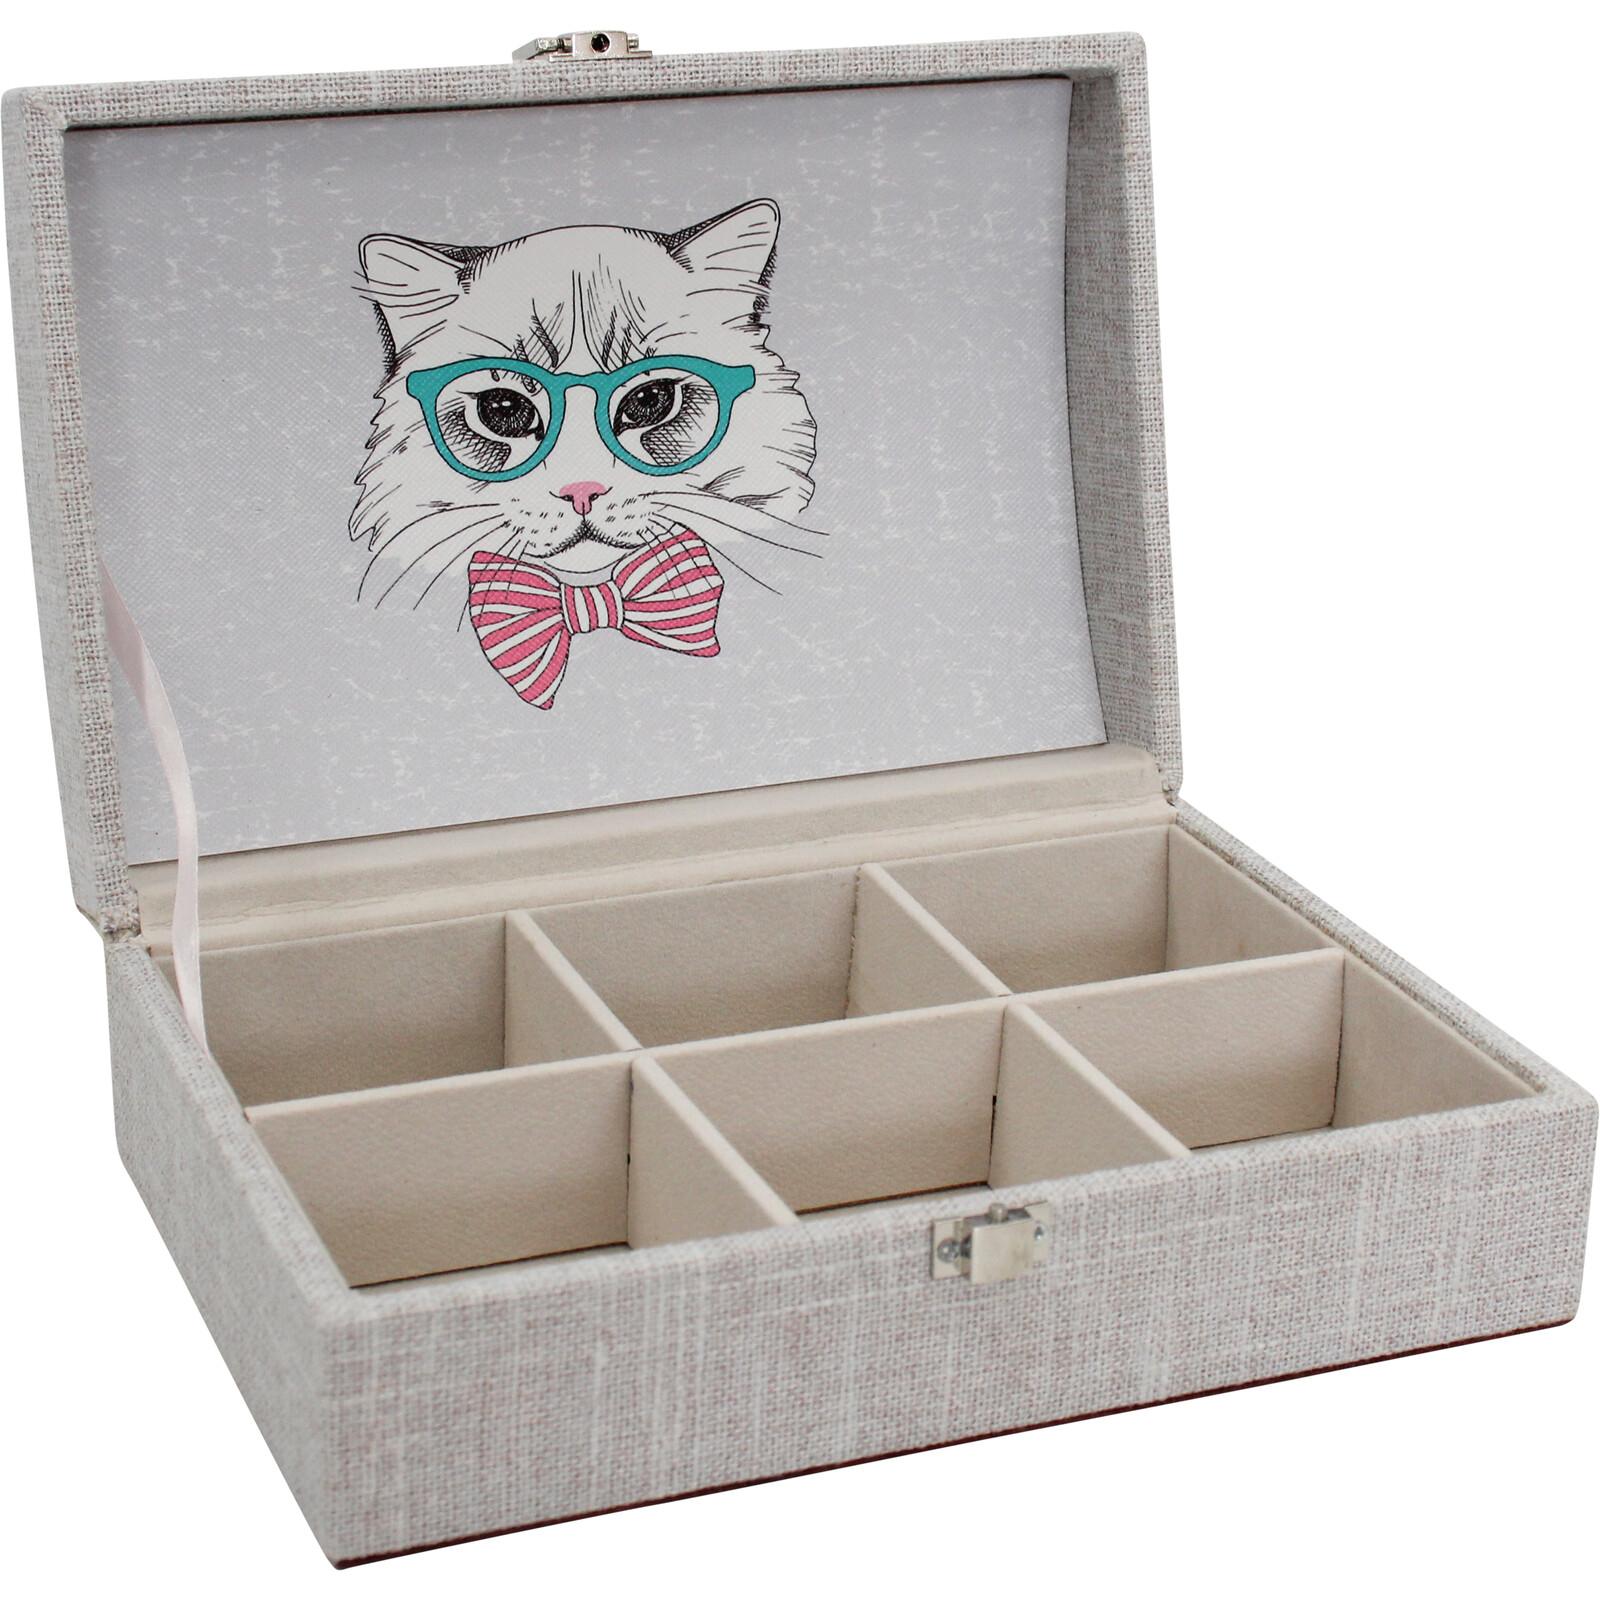 Jewellery Box SophistiCATed